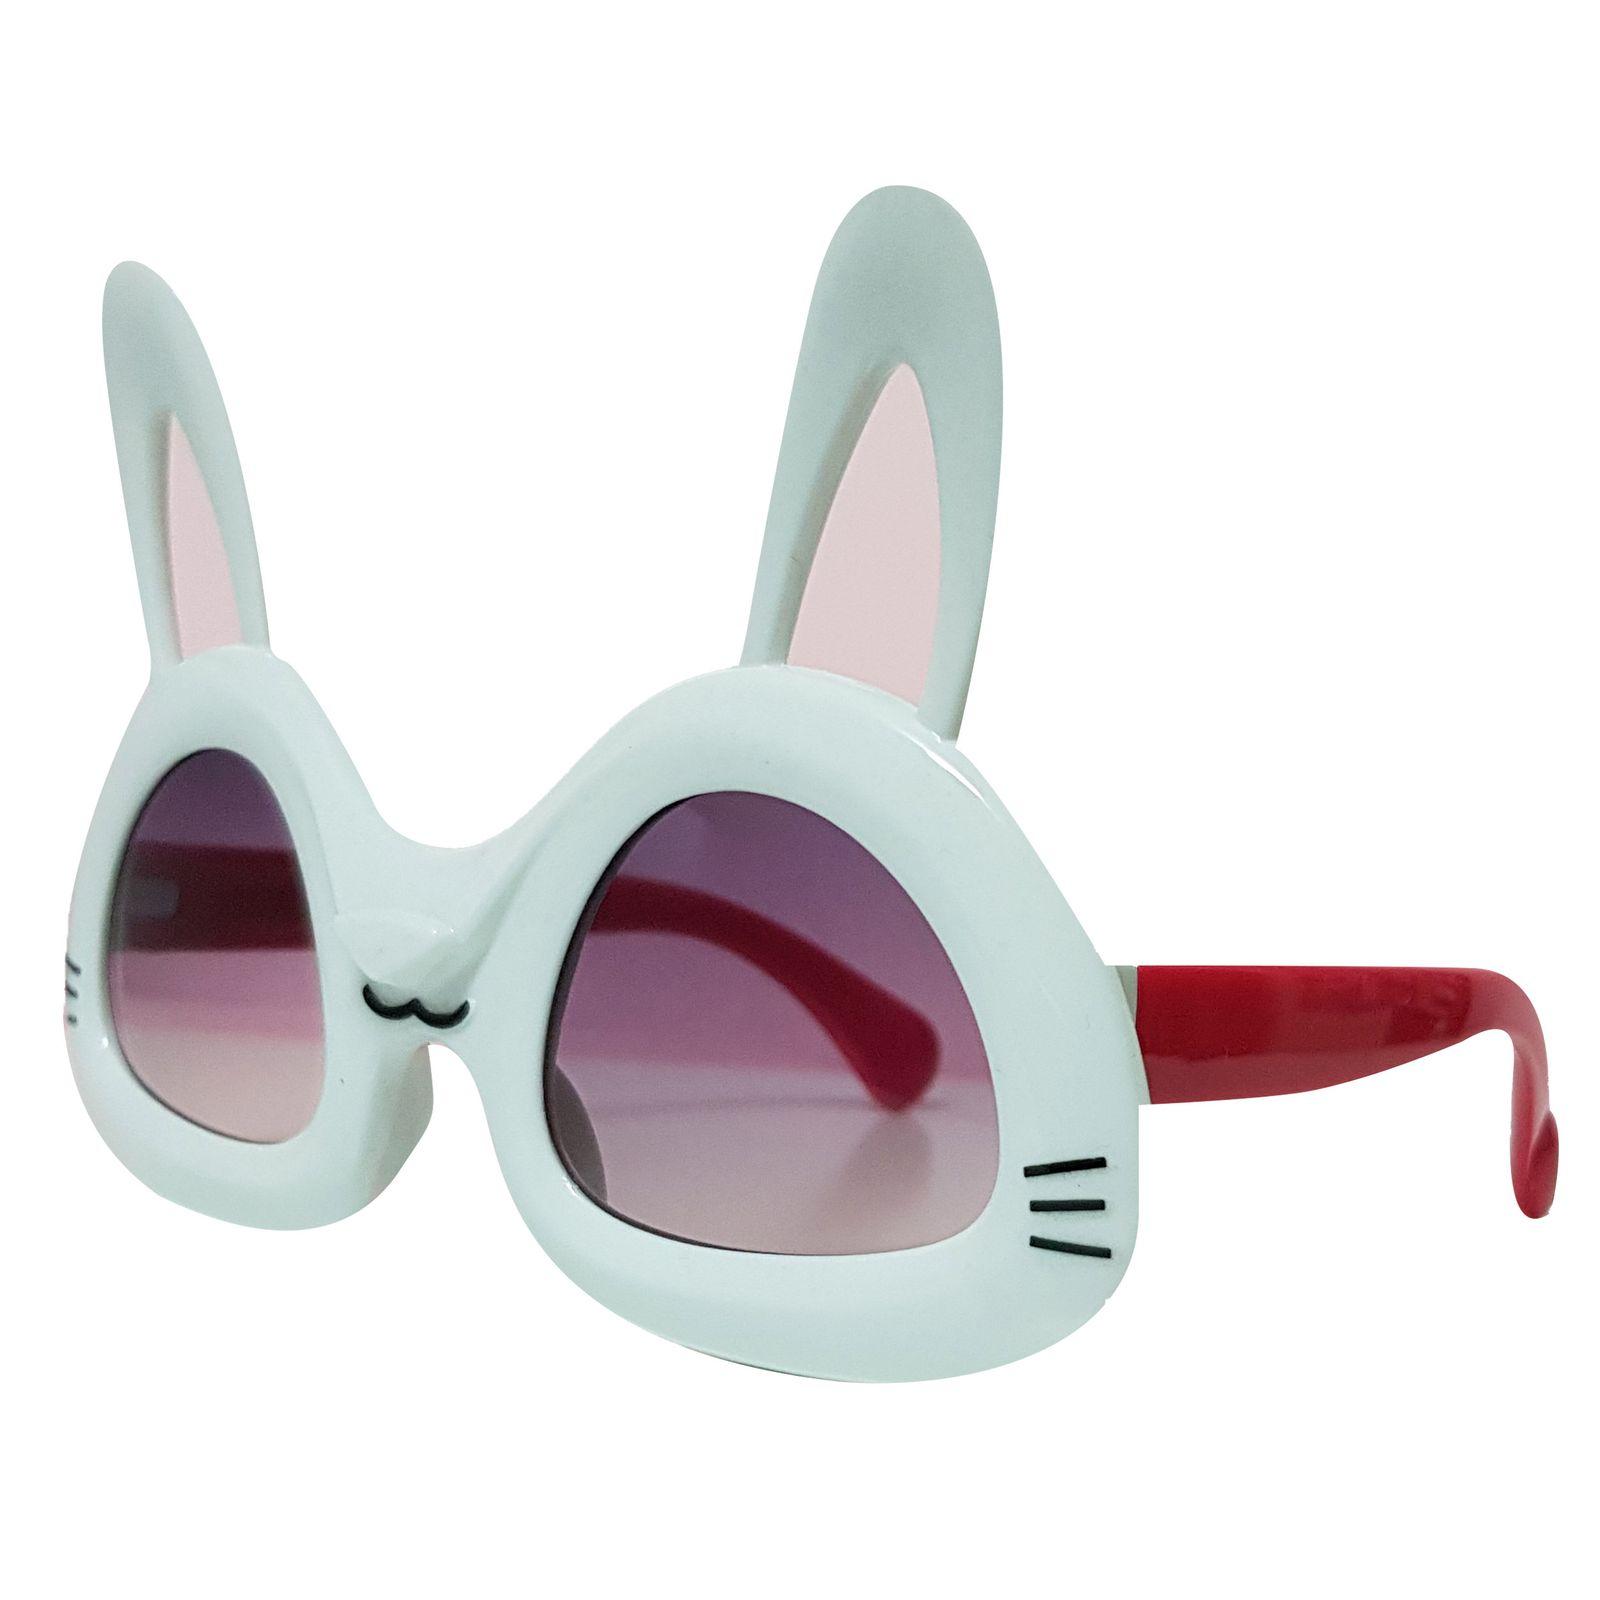 عینک آفتابی بچگانه طرح خرگوش کد KD61004 -  - 3